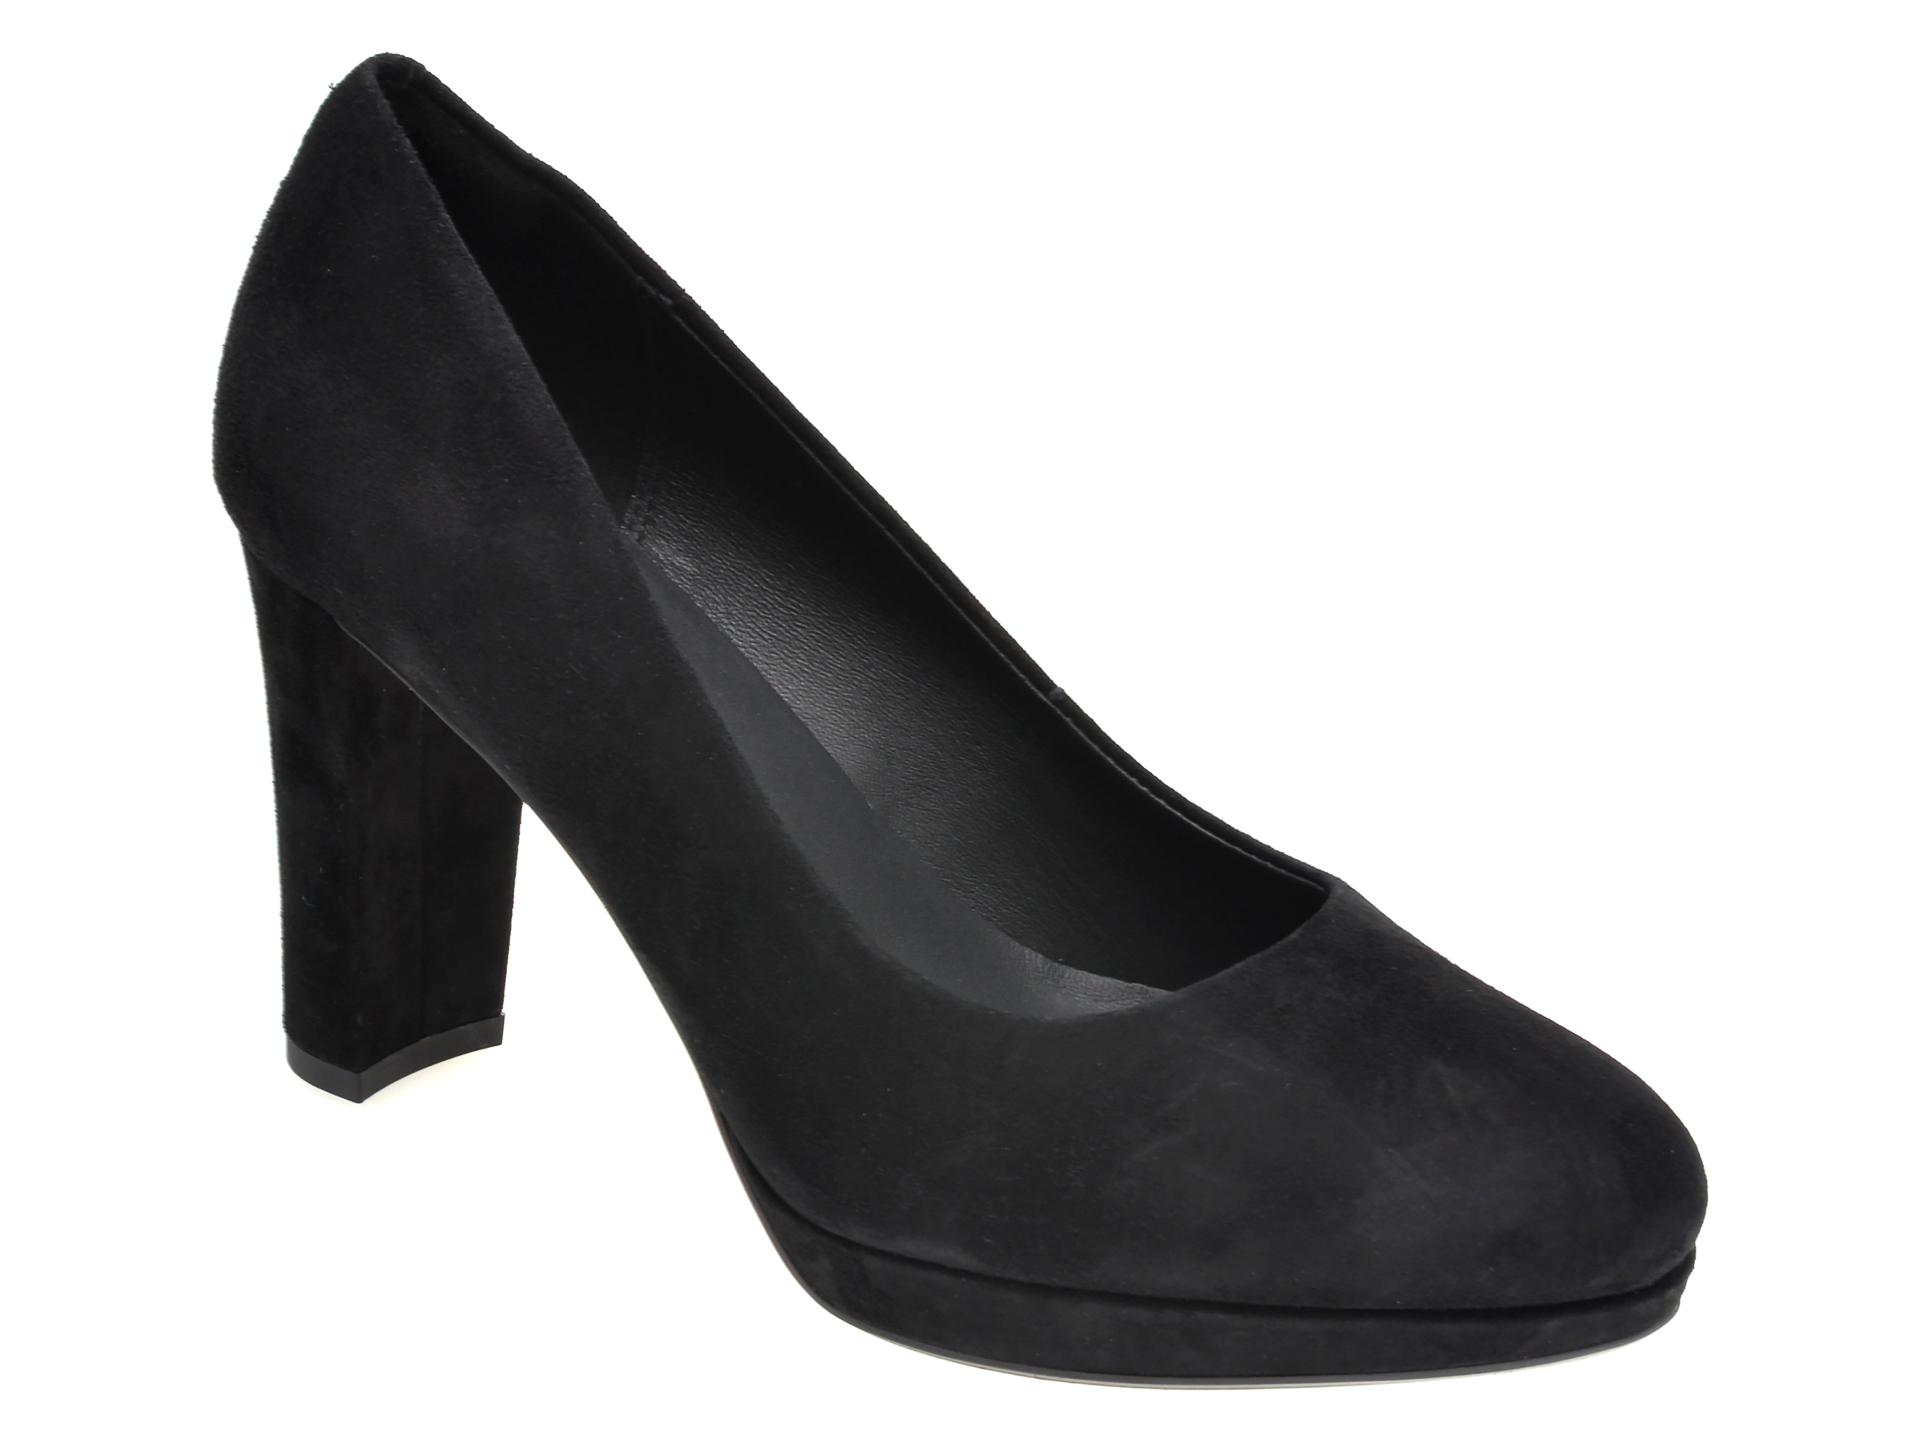 Pantofi CLARKS negri, KENDRA SIENNA, din piele intoarsa imagine